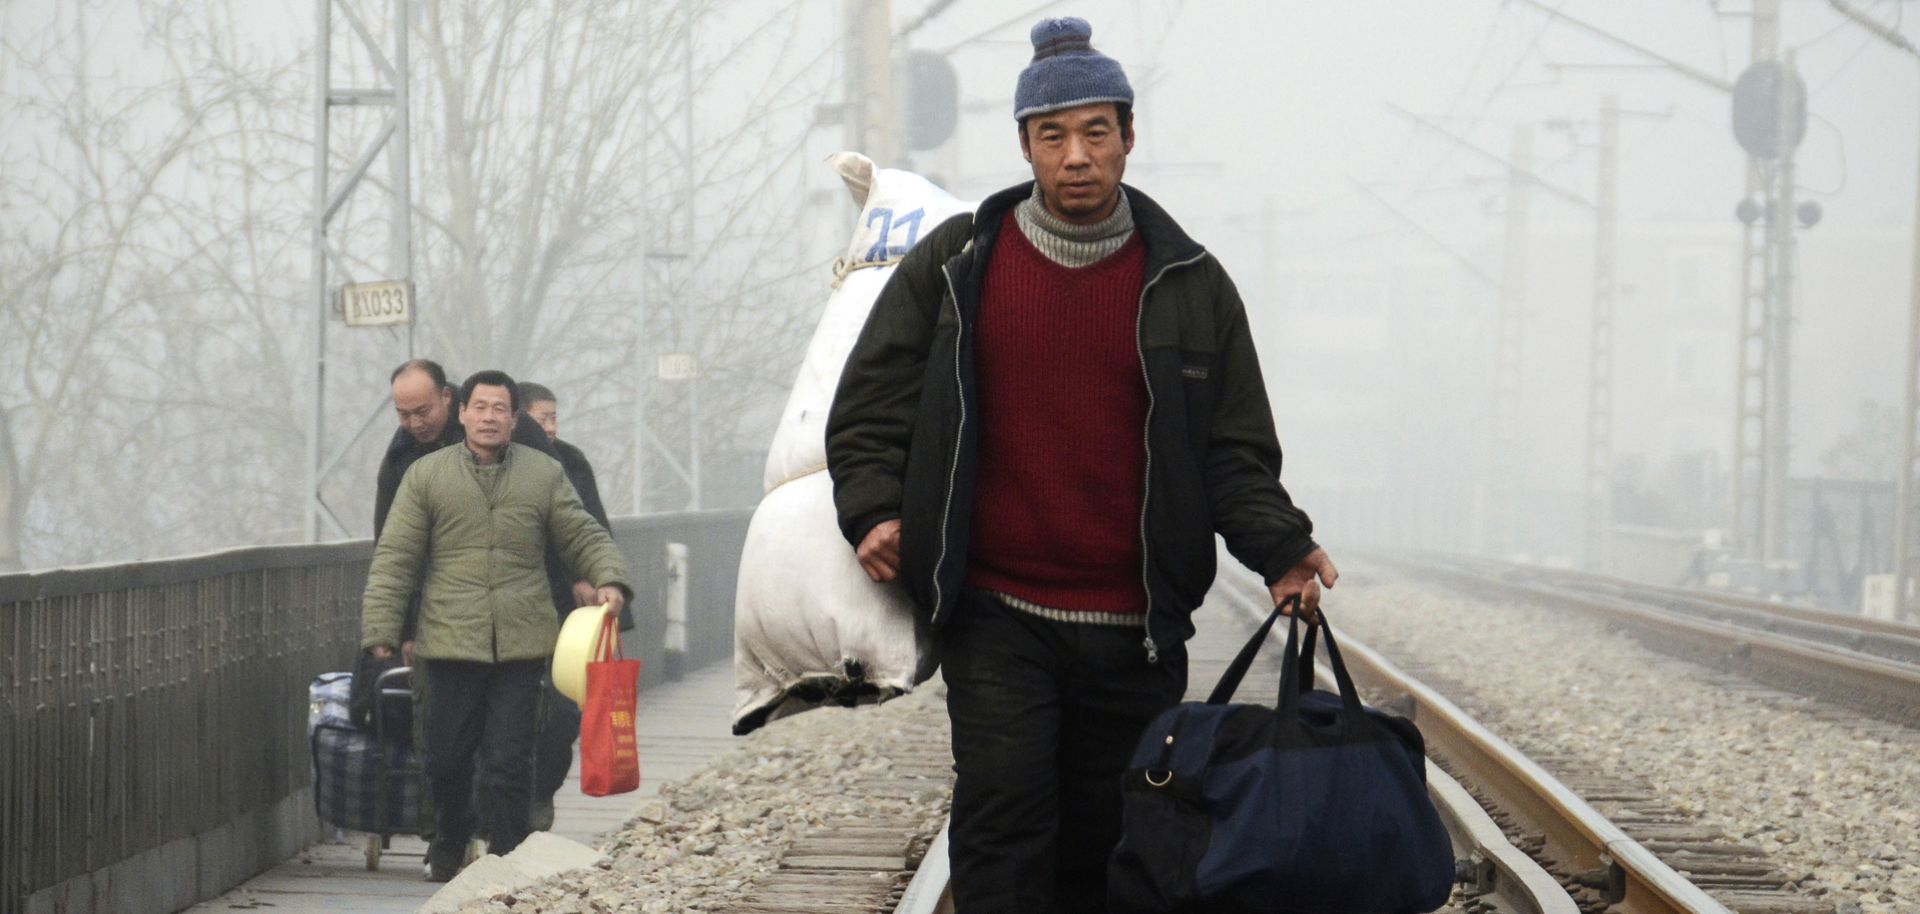 Migrants in China fuel rapid urbanization rates